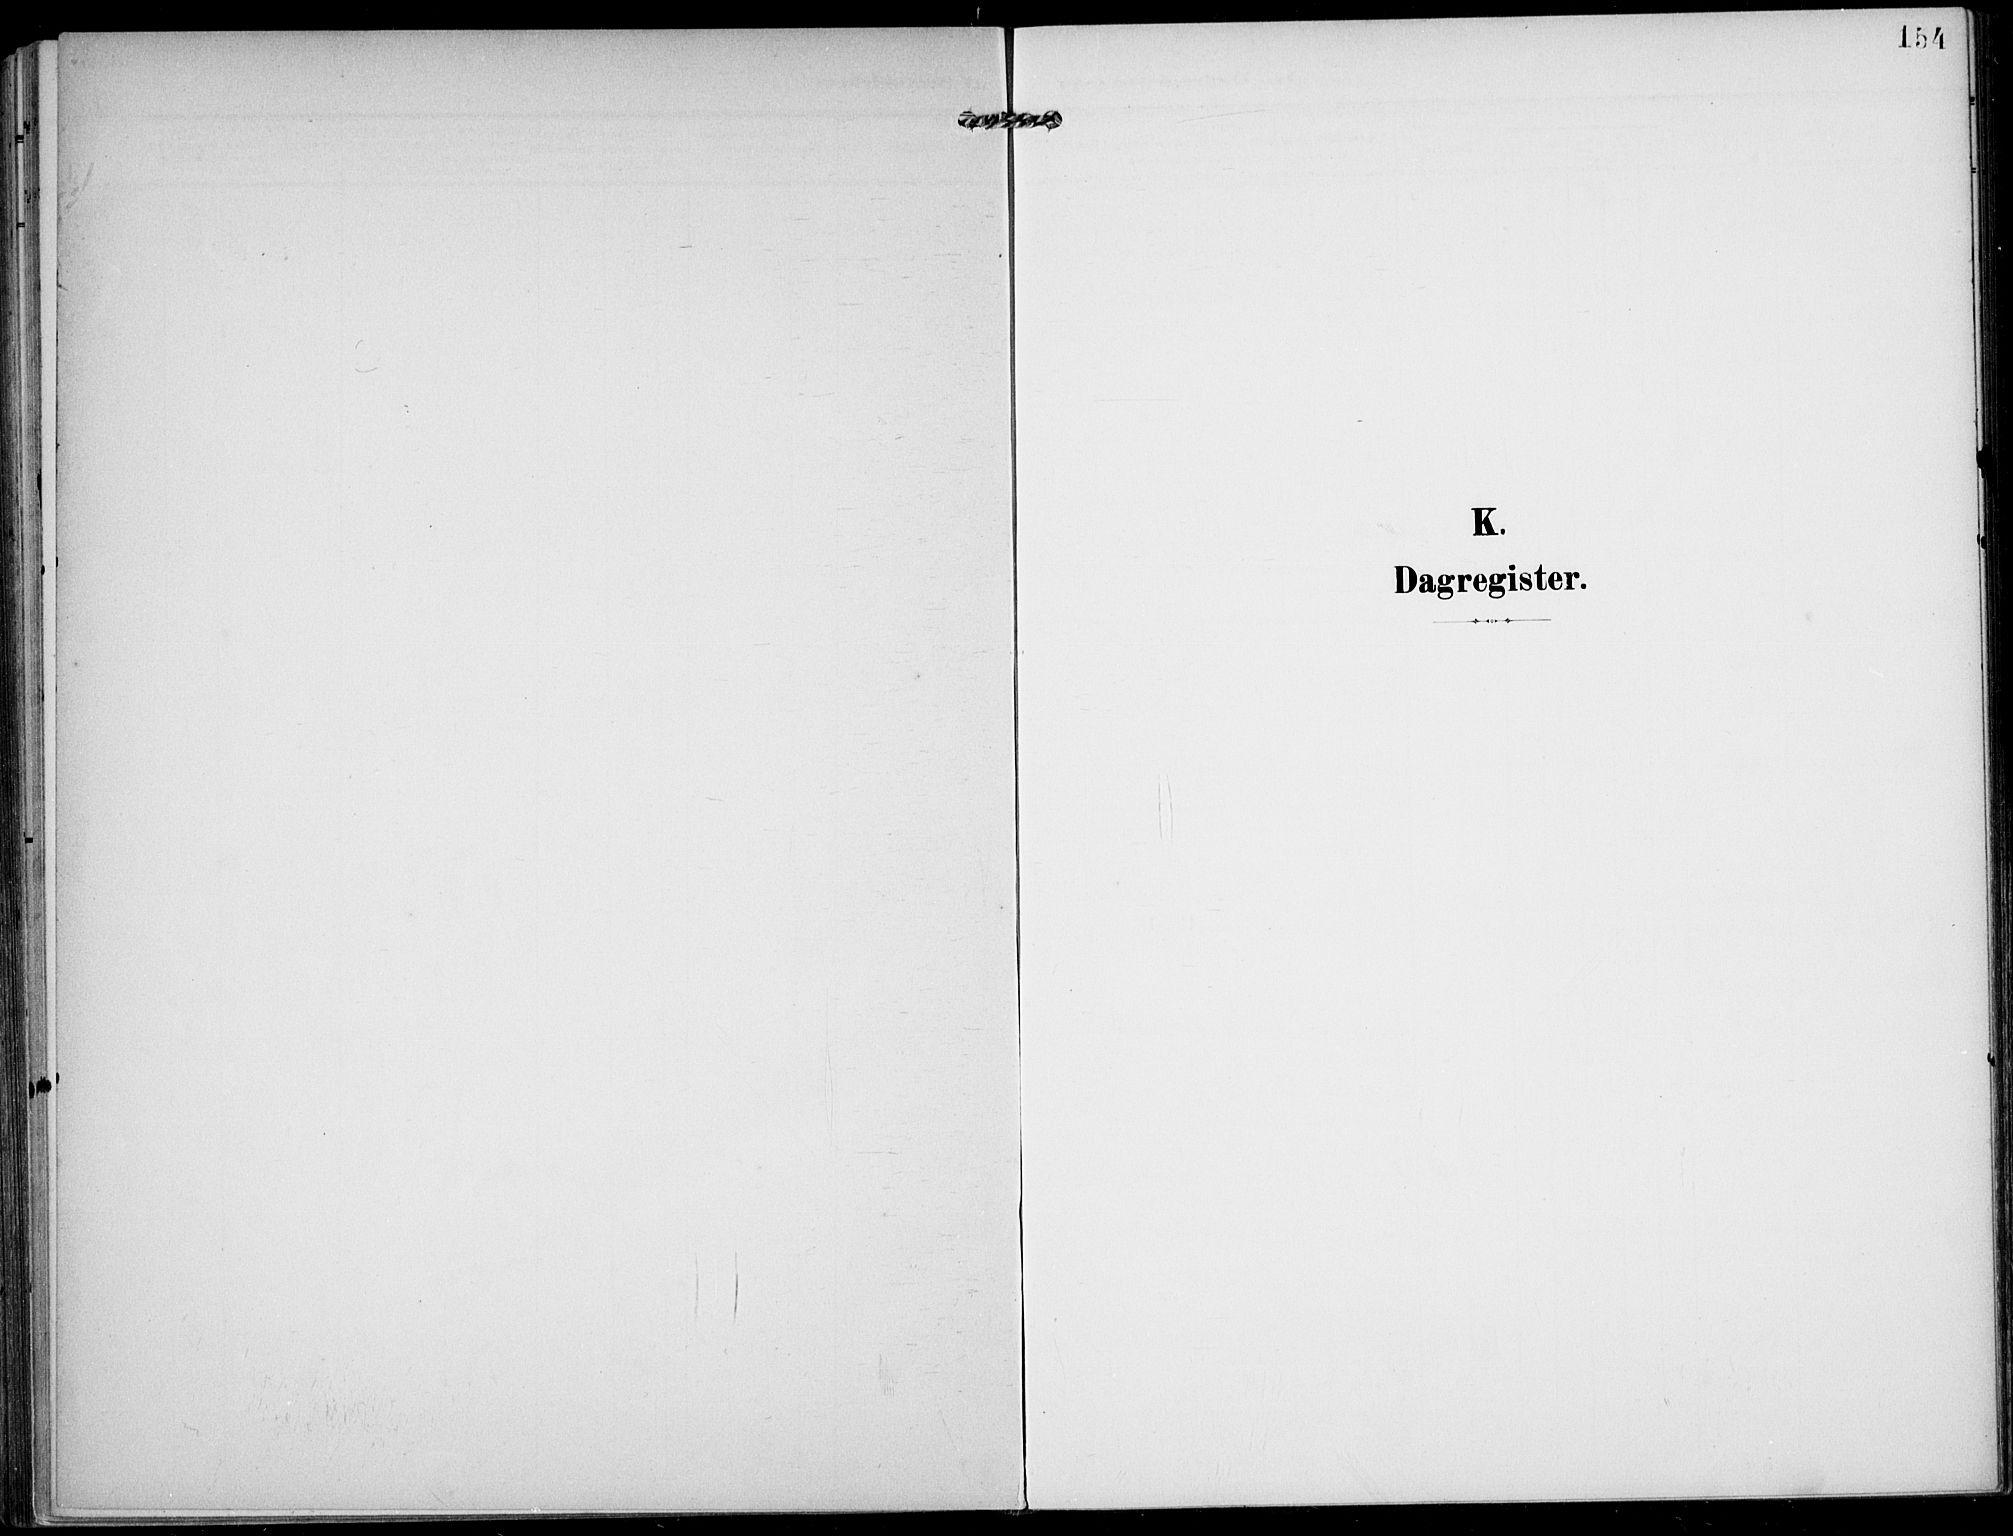 SAKO, Lunde kirkebøker, F/Fa/L0004: Ministerialbok nr. I 4, 1902-1913, s. 154